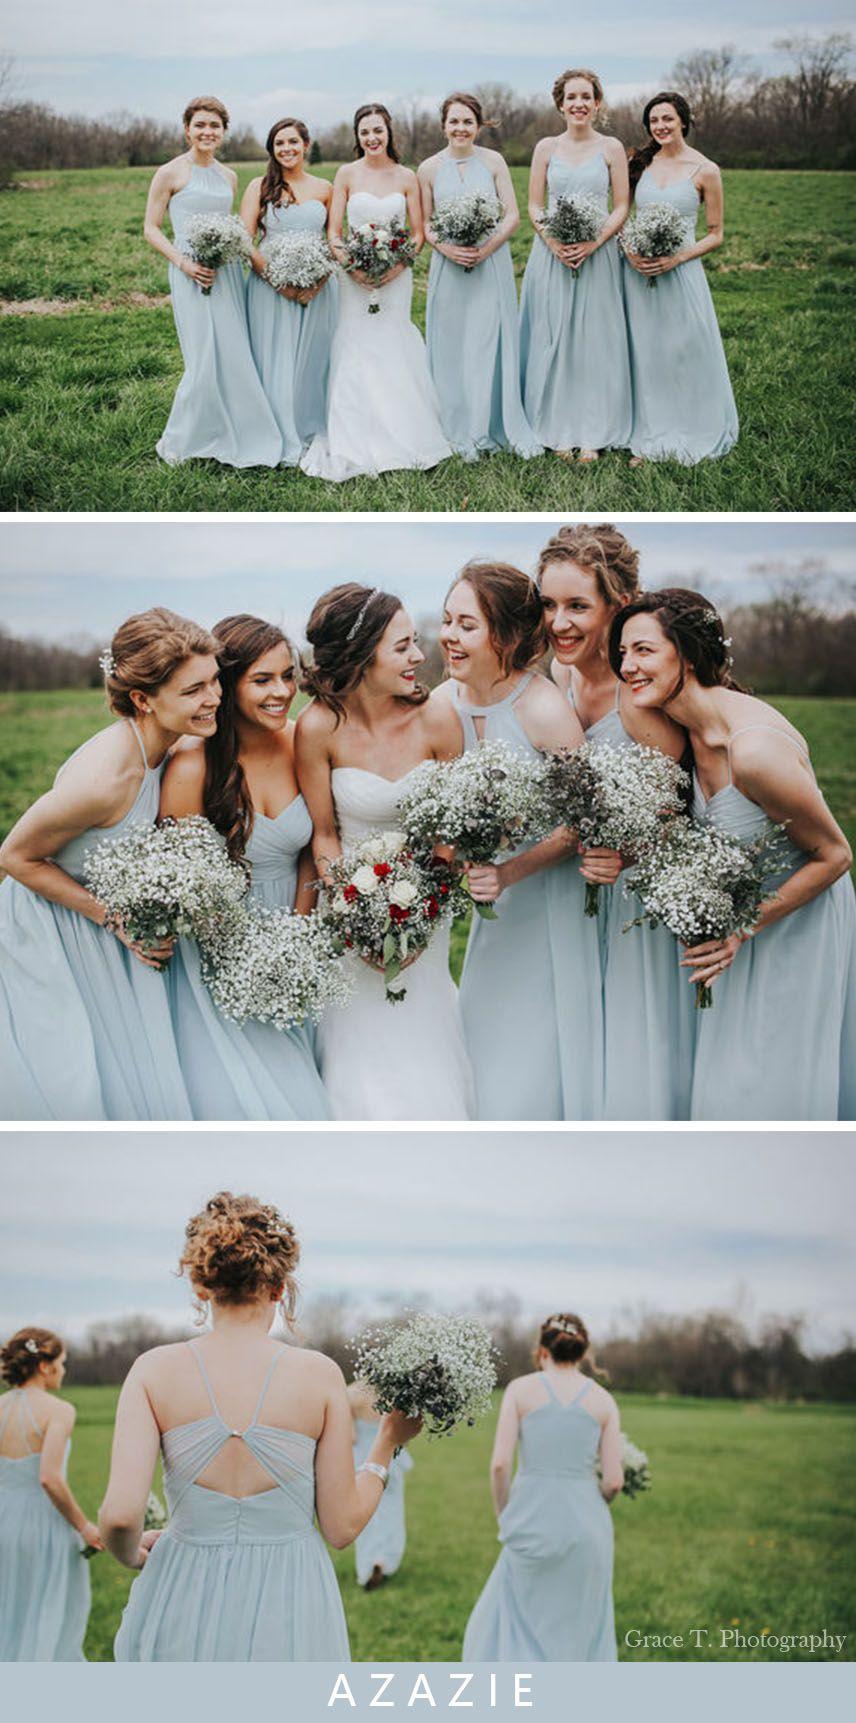 Azazie Mist Bridesmaid Dresses Real Wedding Inspirations Mist Bridesmaid Dress Summer Bridesmaid Dresses Bridesmaid Dresses [ 1723 x 856 Pixel ]